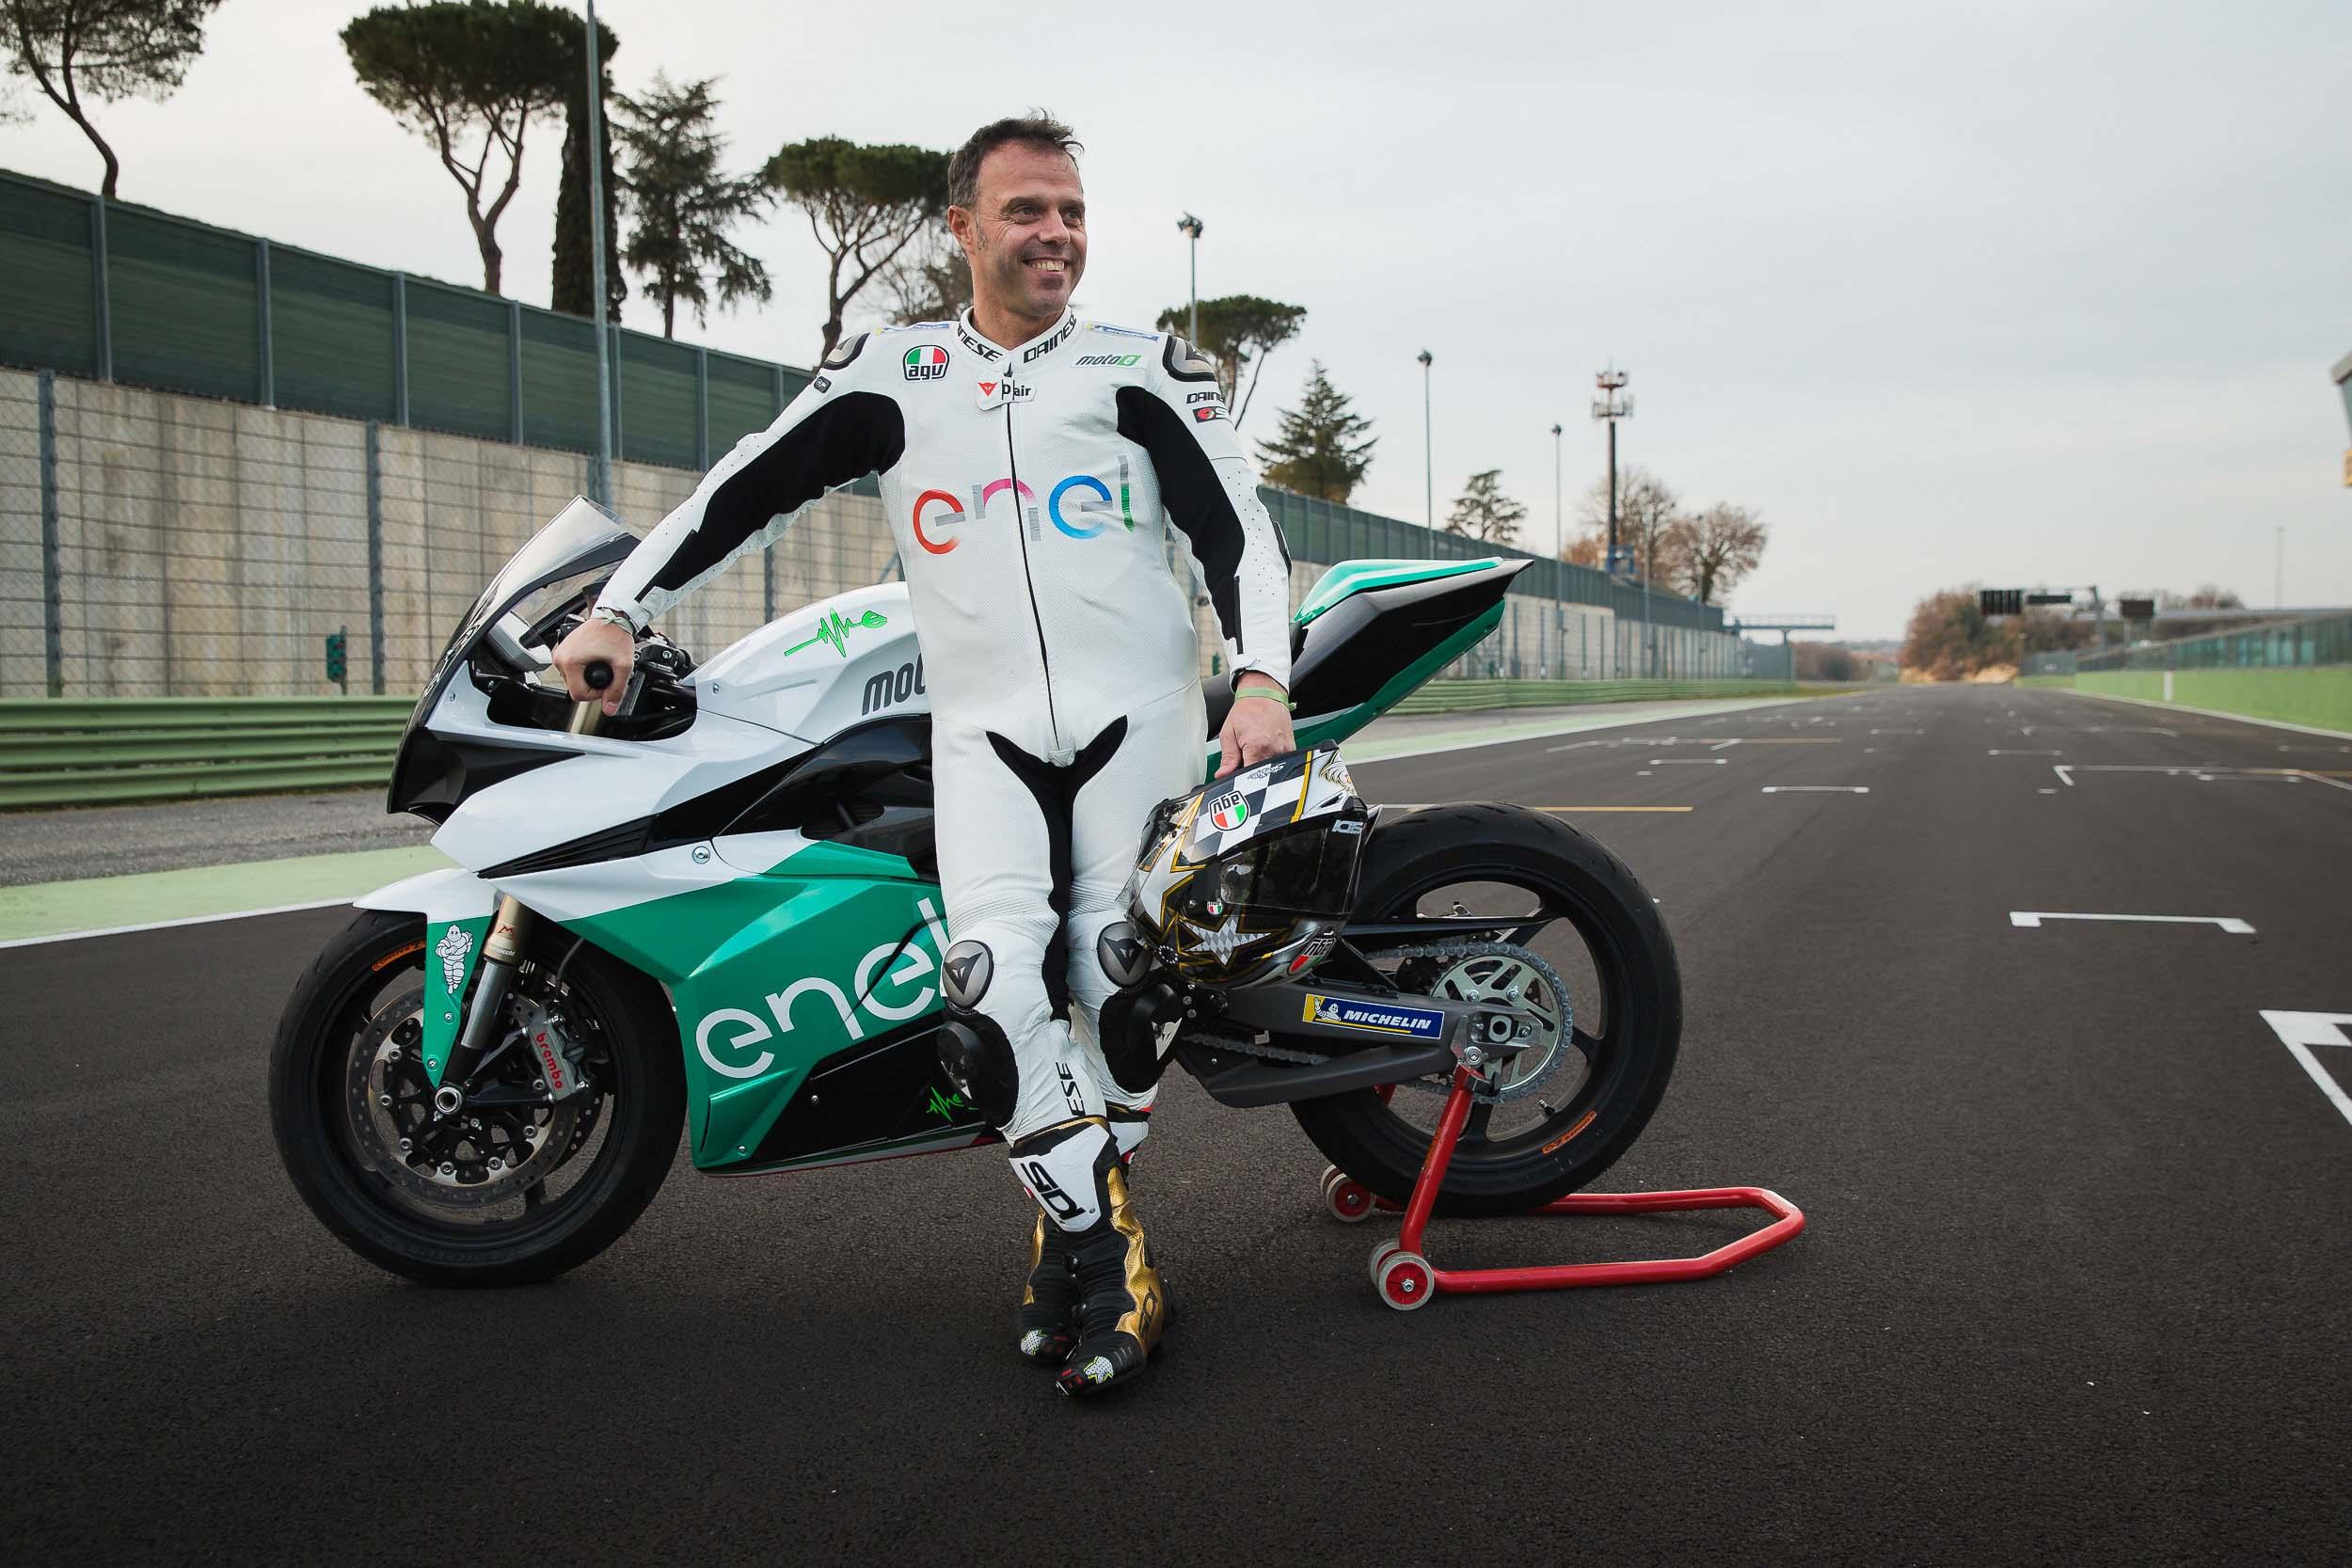 La sportive verte du futur - Page 16 FIM-Enel-MotoE-World-Cup-Energica-Ego-race-bike-03